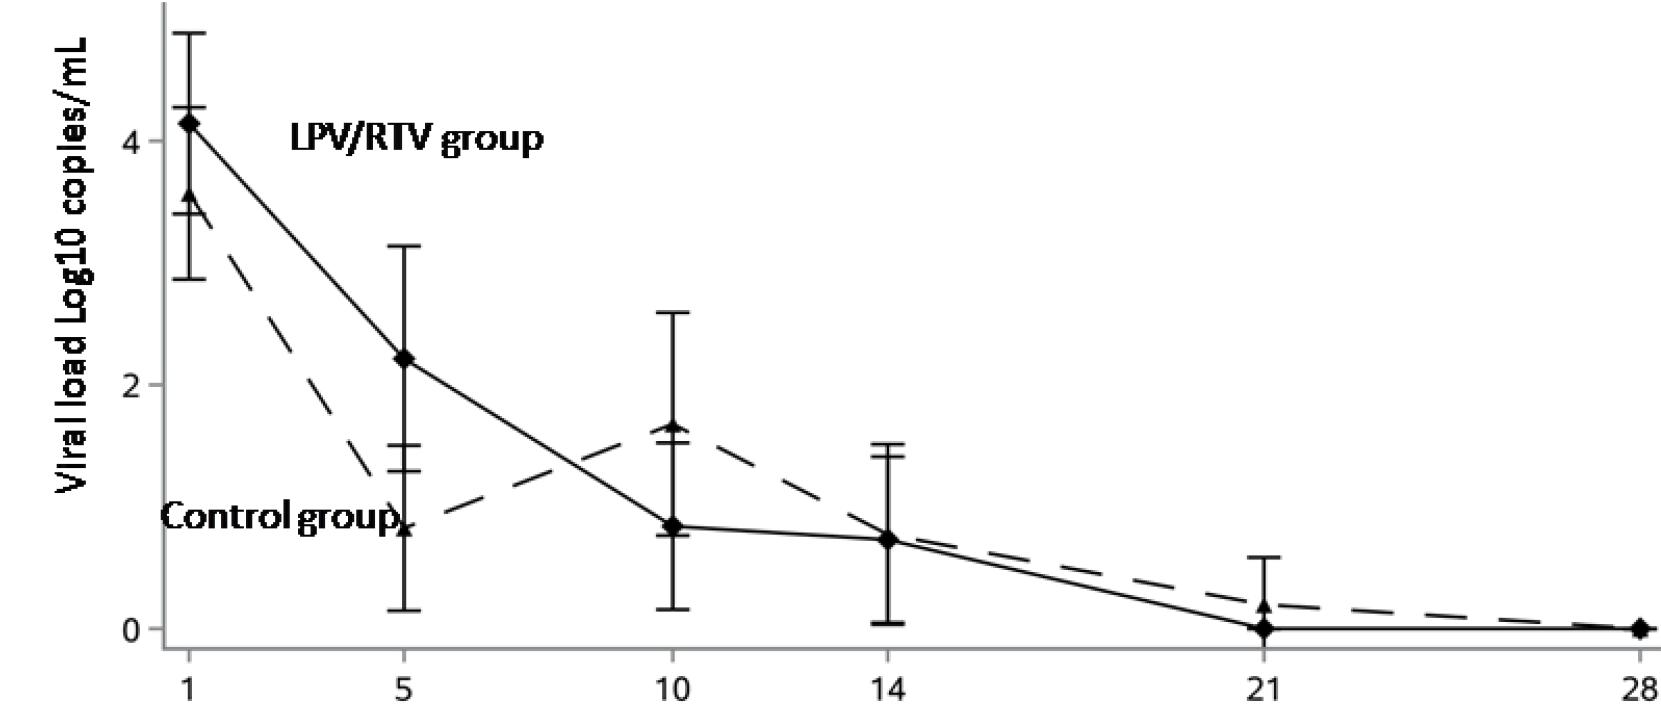 chictr2000029308 results 11 - Коронавирус. Лекарства. Лопинавир и ритонавир не помогли в лечении COVID-19